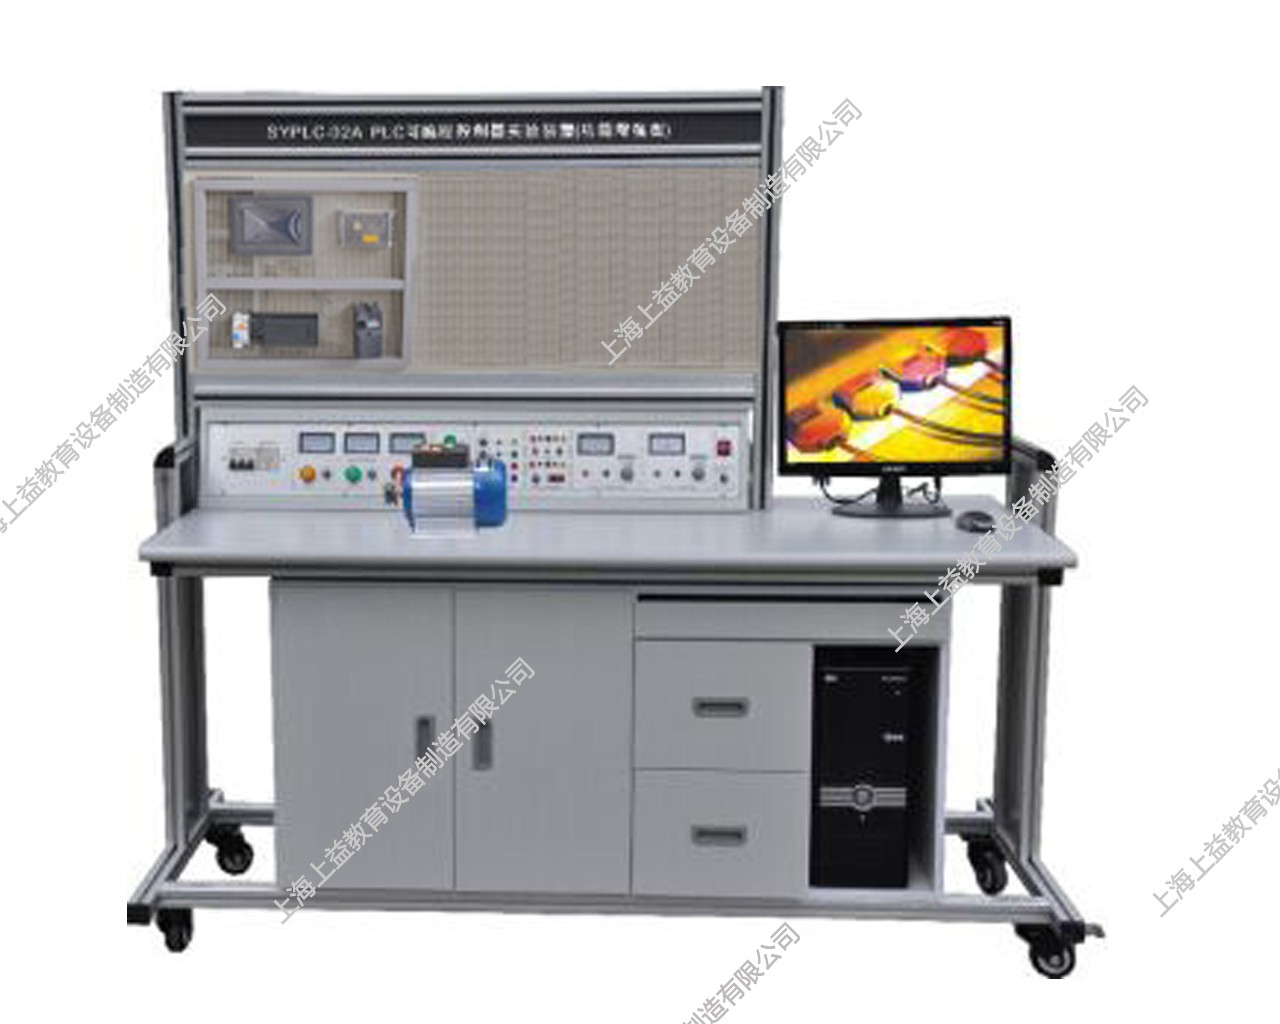 SYPLX-01C网孔型PLC、变频器、触摸屏自动化综合wwwlehu8vip装置